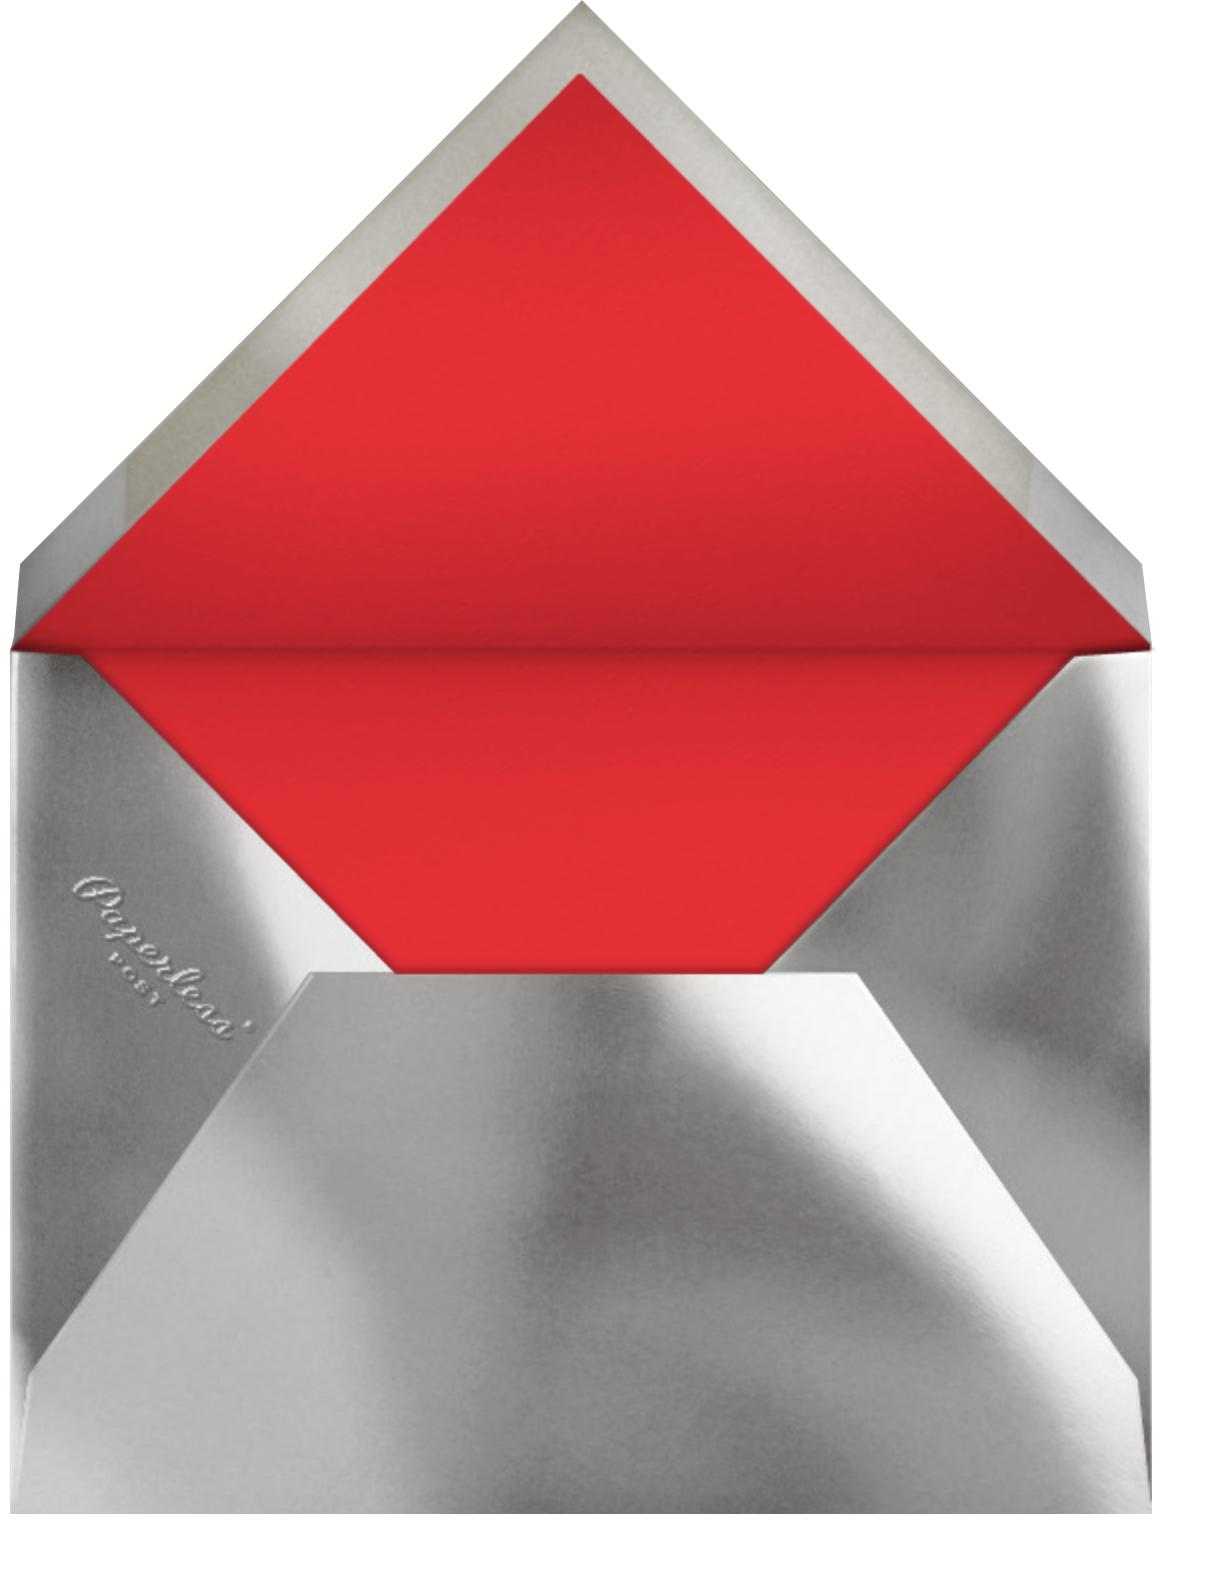 Bordure - Red/Silver - Paperless Post - Christmas - envelope back